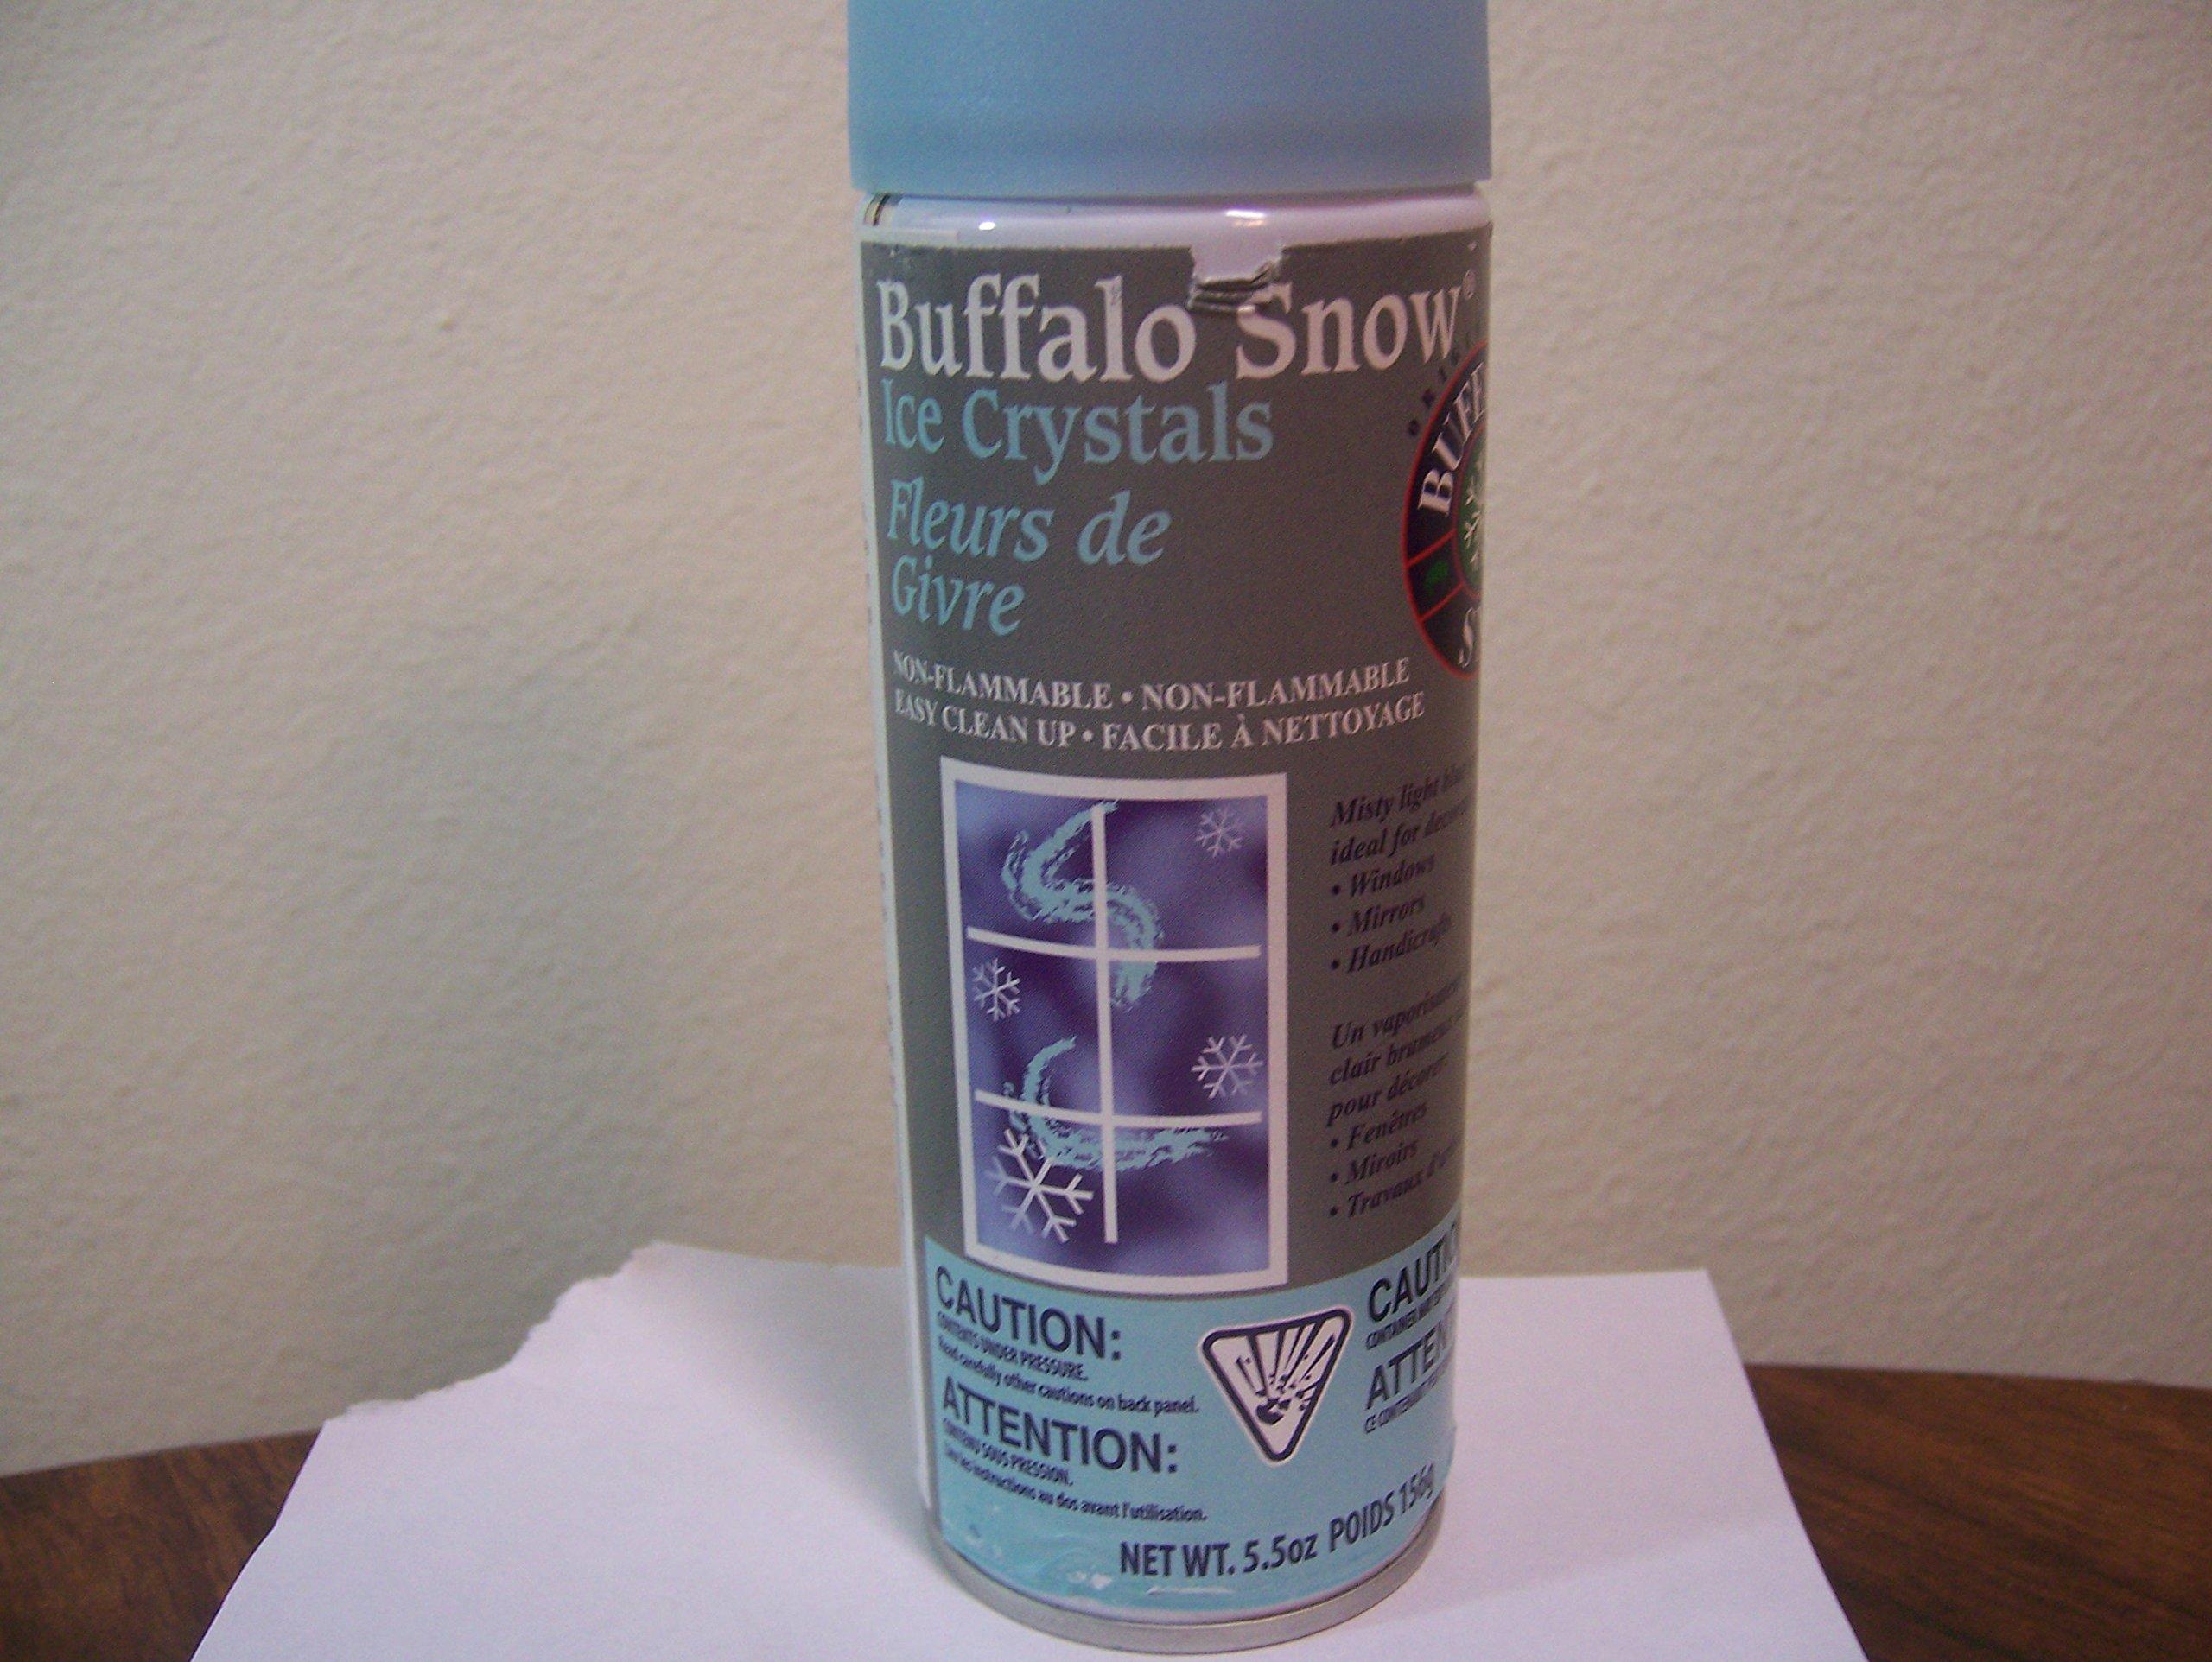 Buffalo Snow Ice Crystals